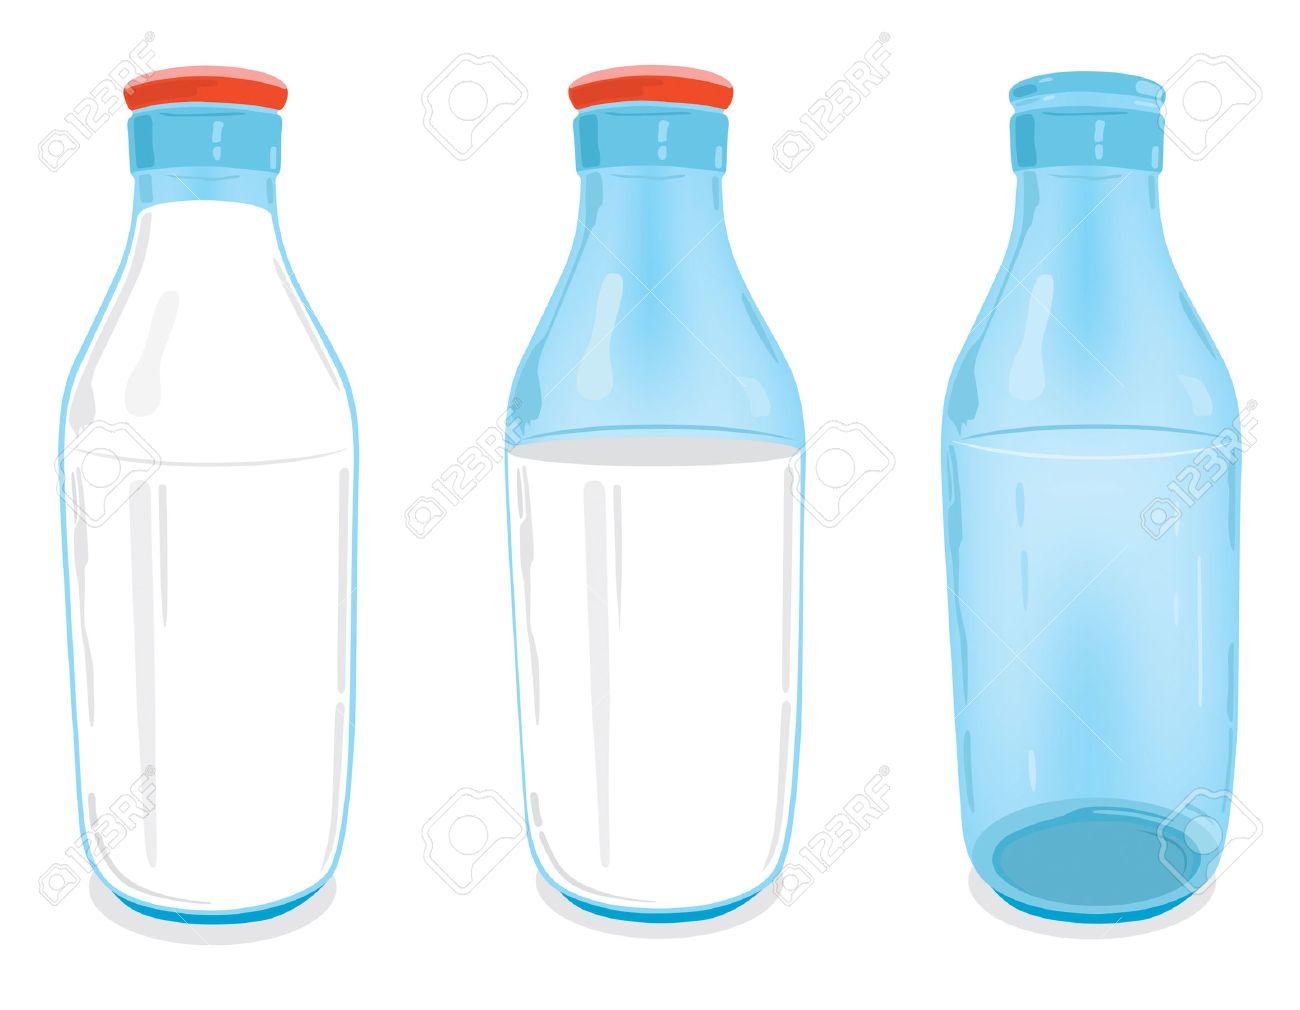 One empty glass milk bottle, one half full glass milk bottle with red bottle cap and one full glass milk bottle with red bottle cap. - 5460811